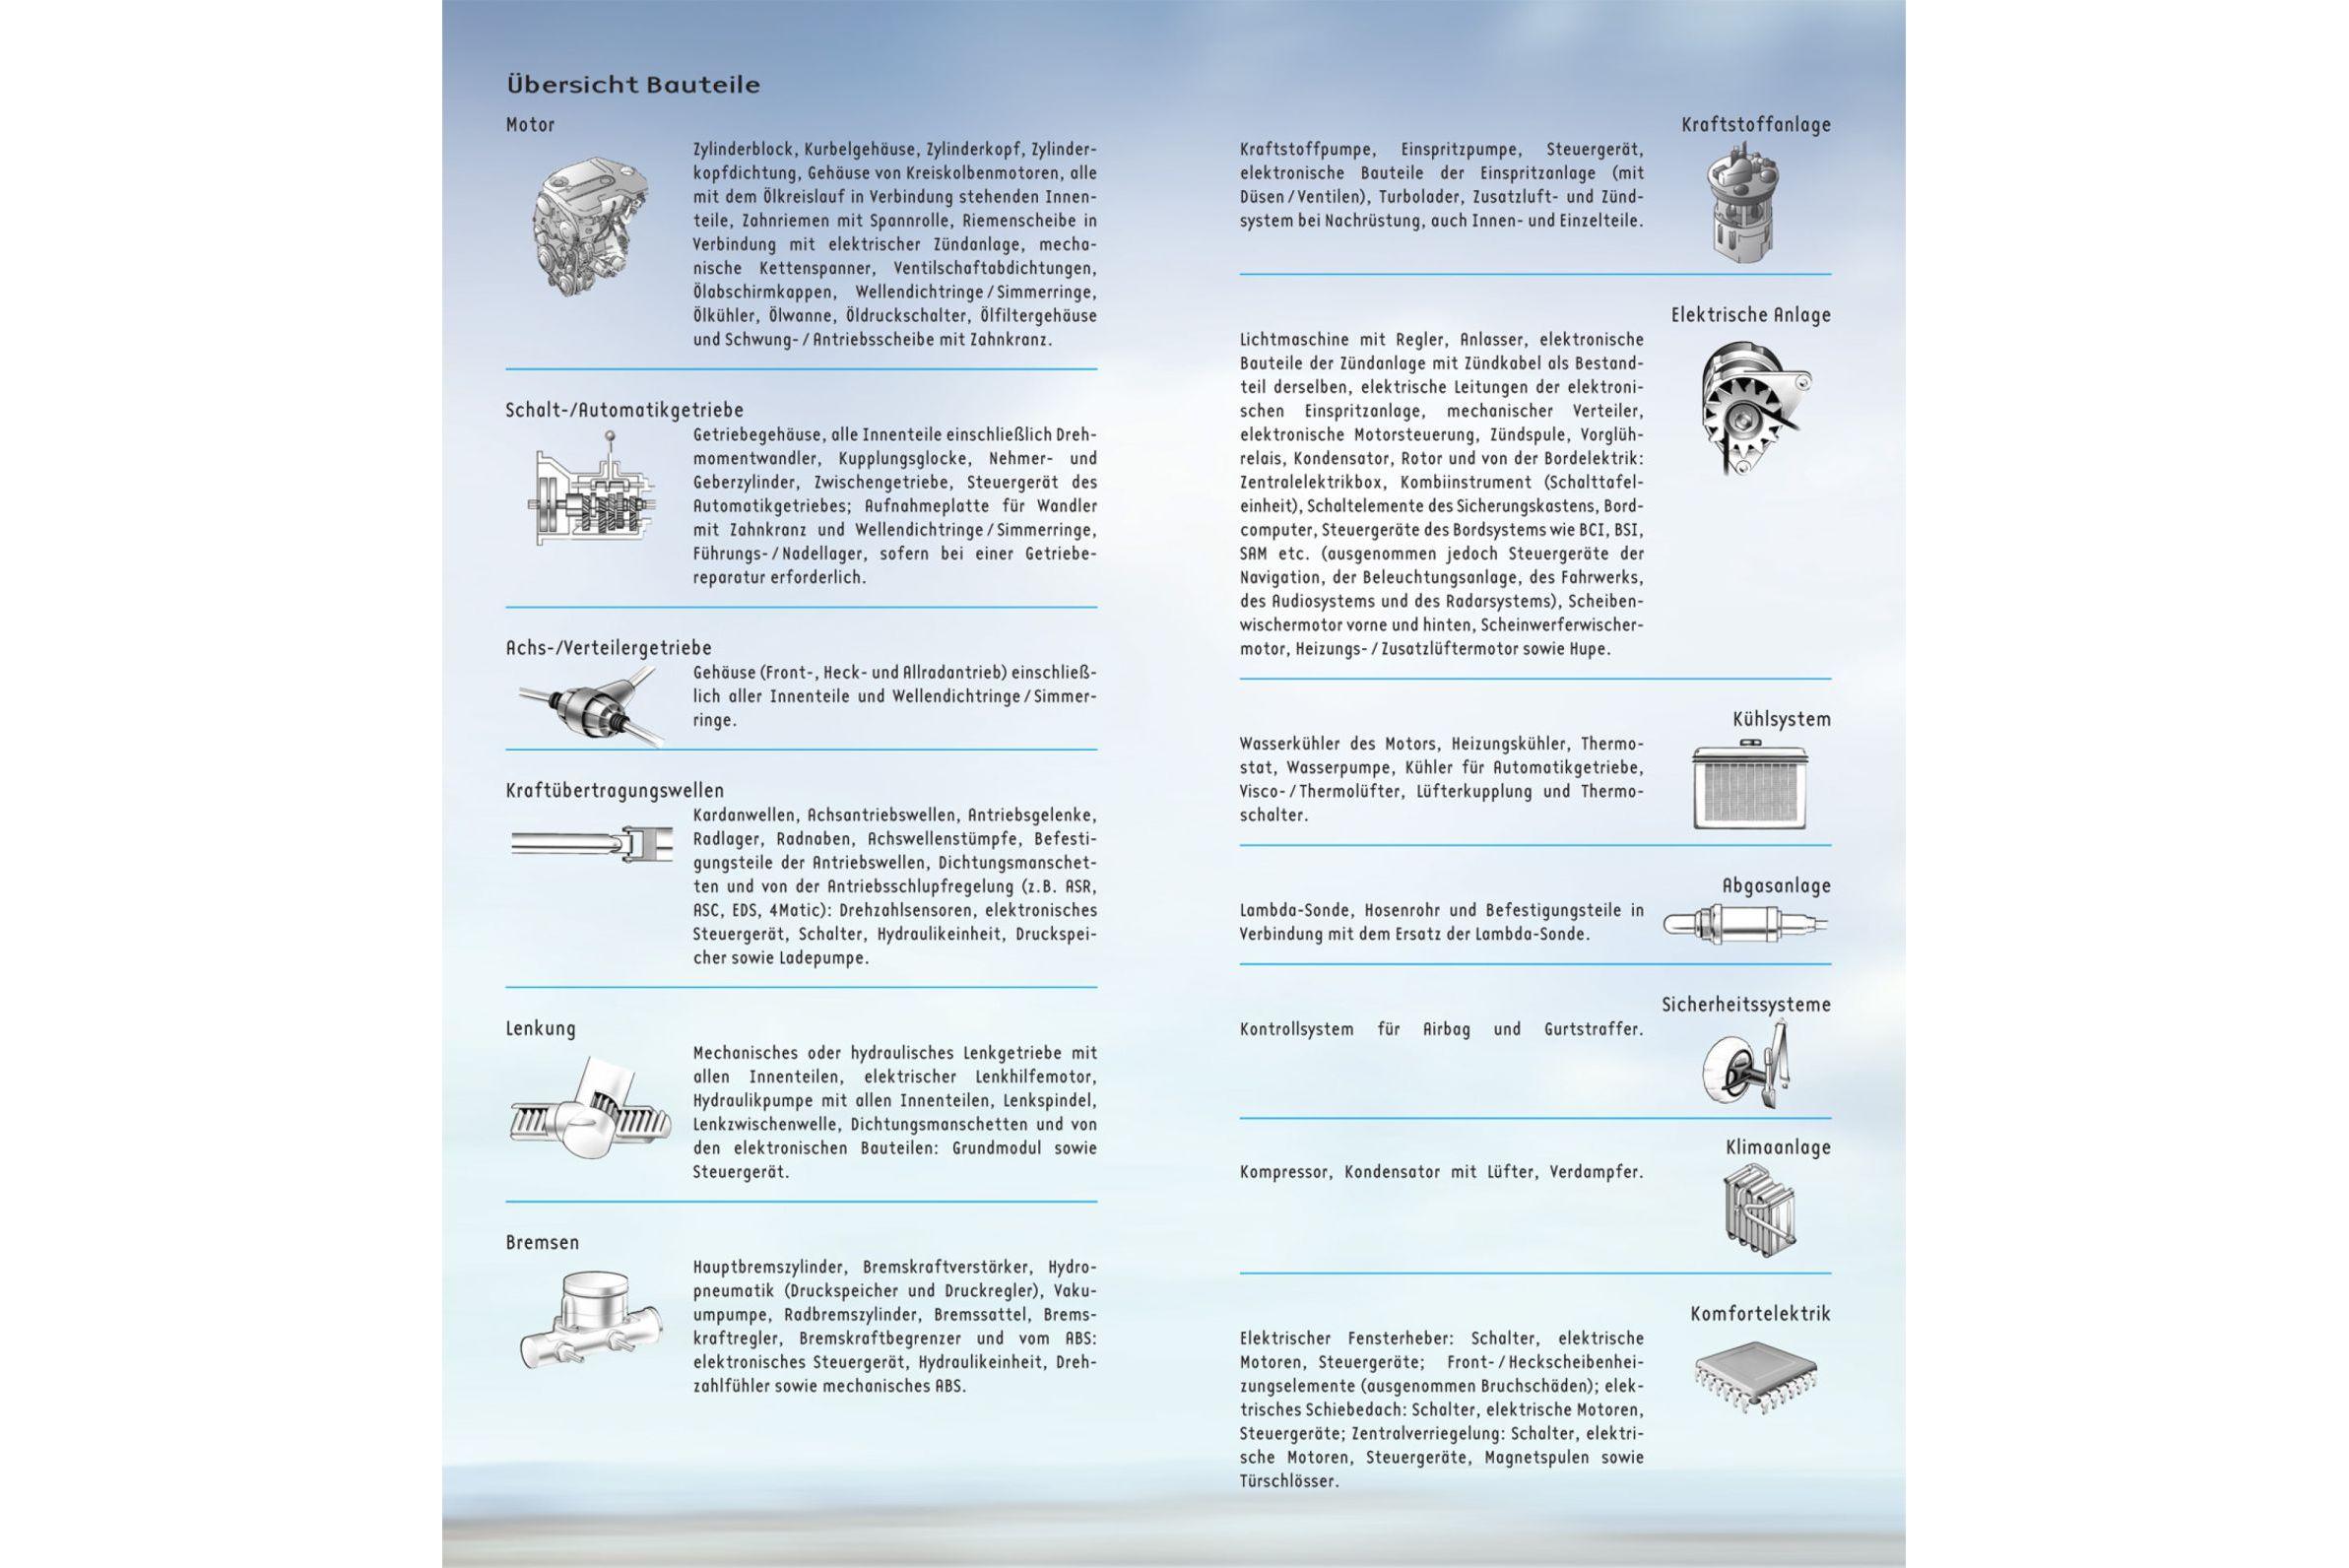 24 monate mazda 5,6, cx-5 neufahrzeug anschlussgarantie | autohaus